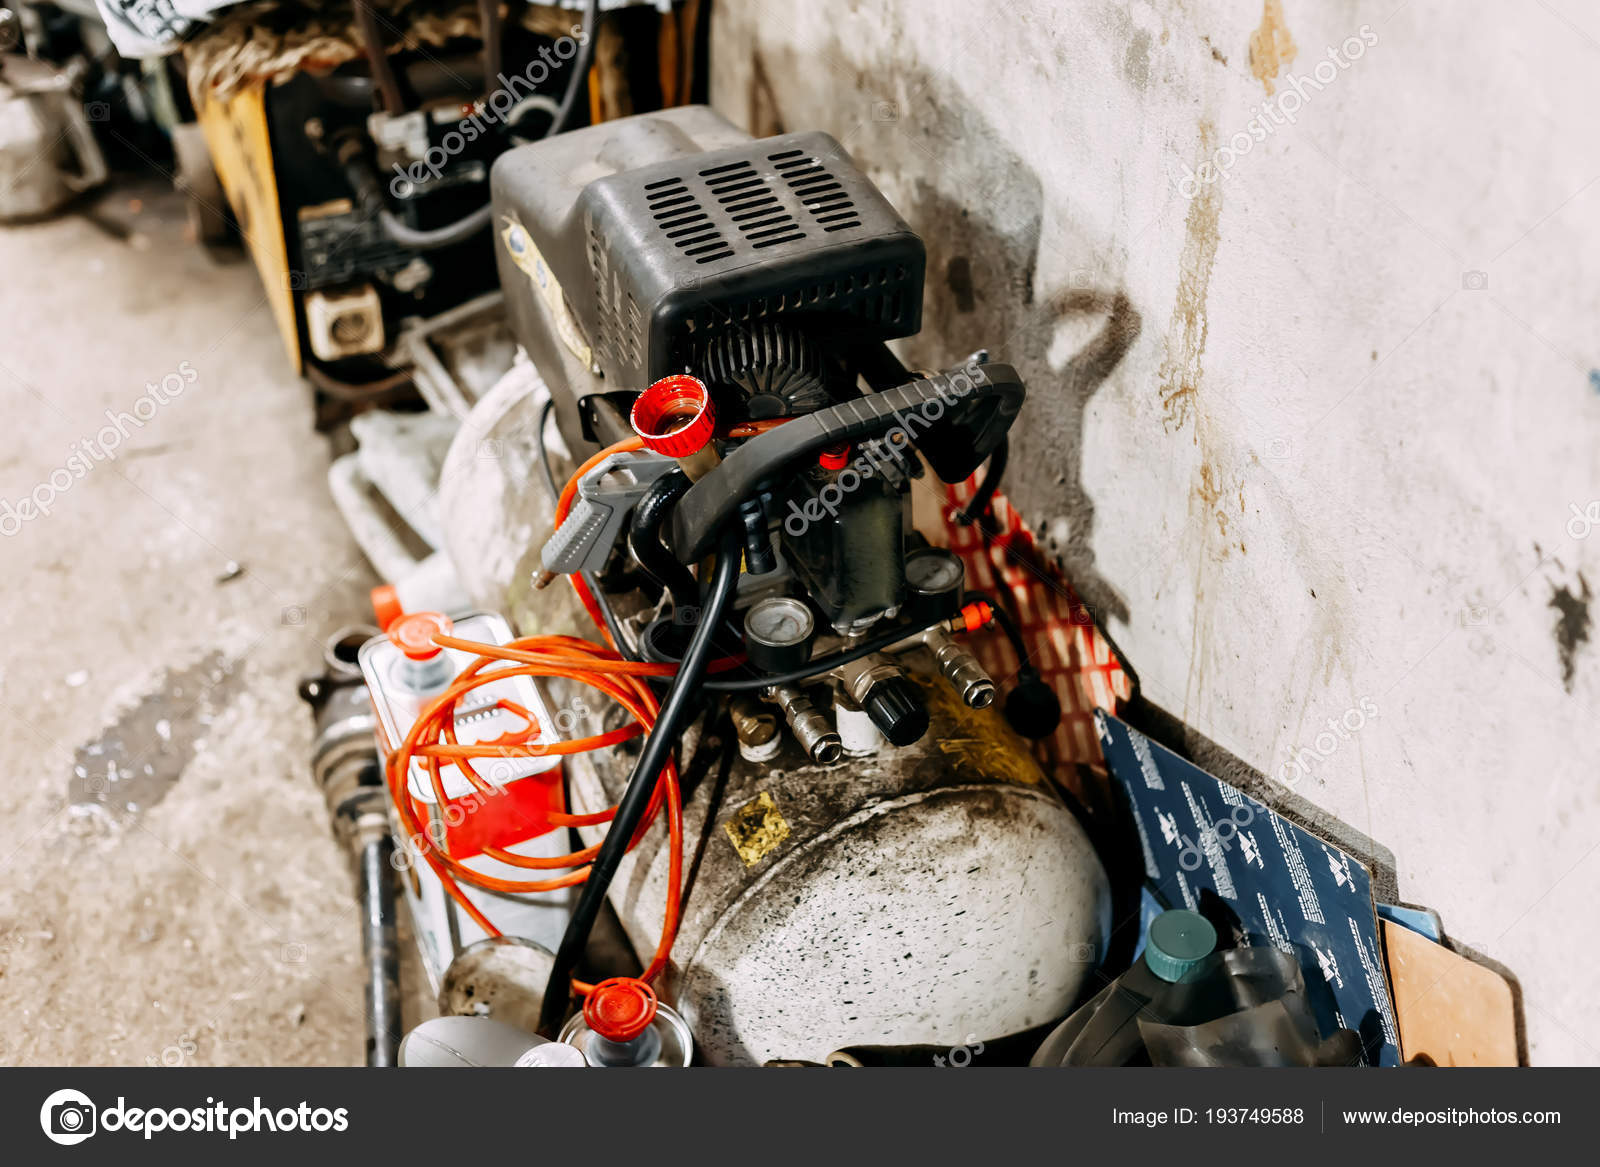 lb compressor my propane youtube homemade watch garage air tank for